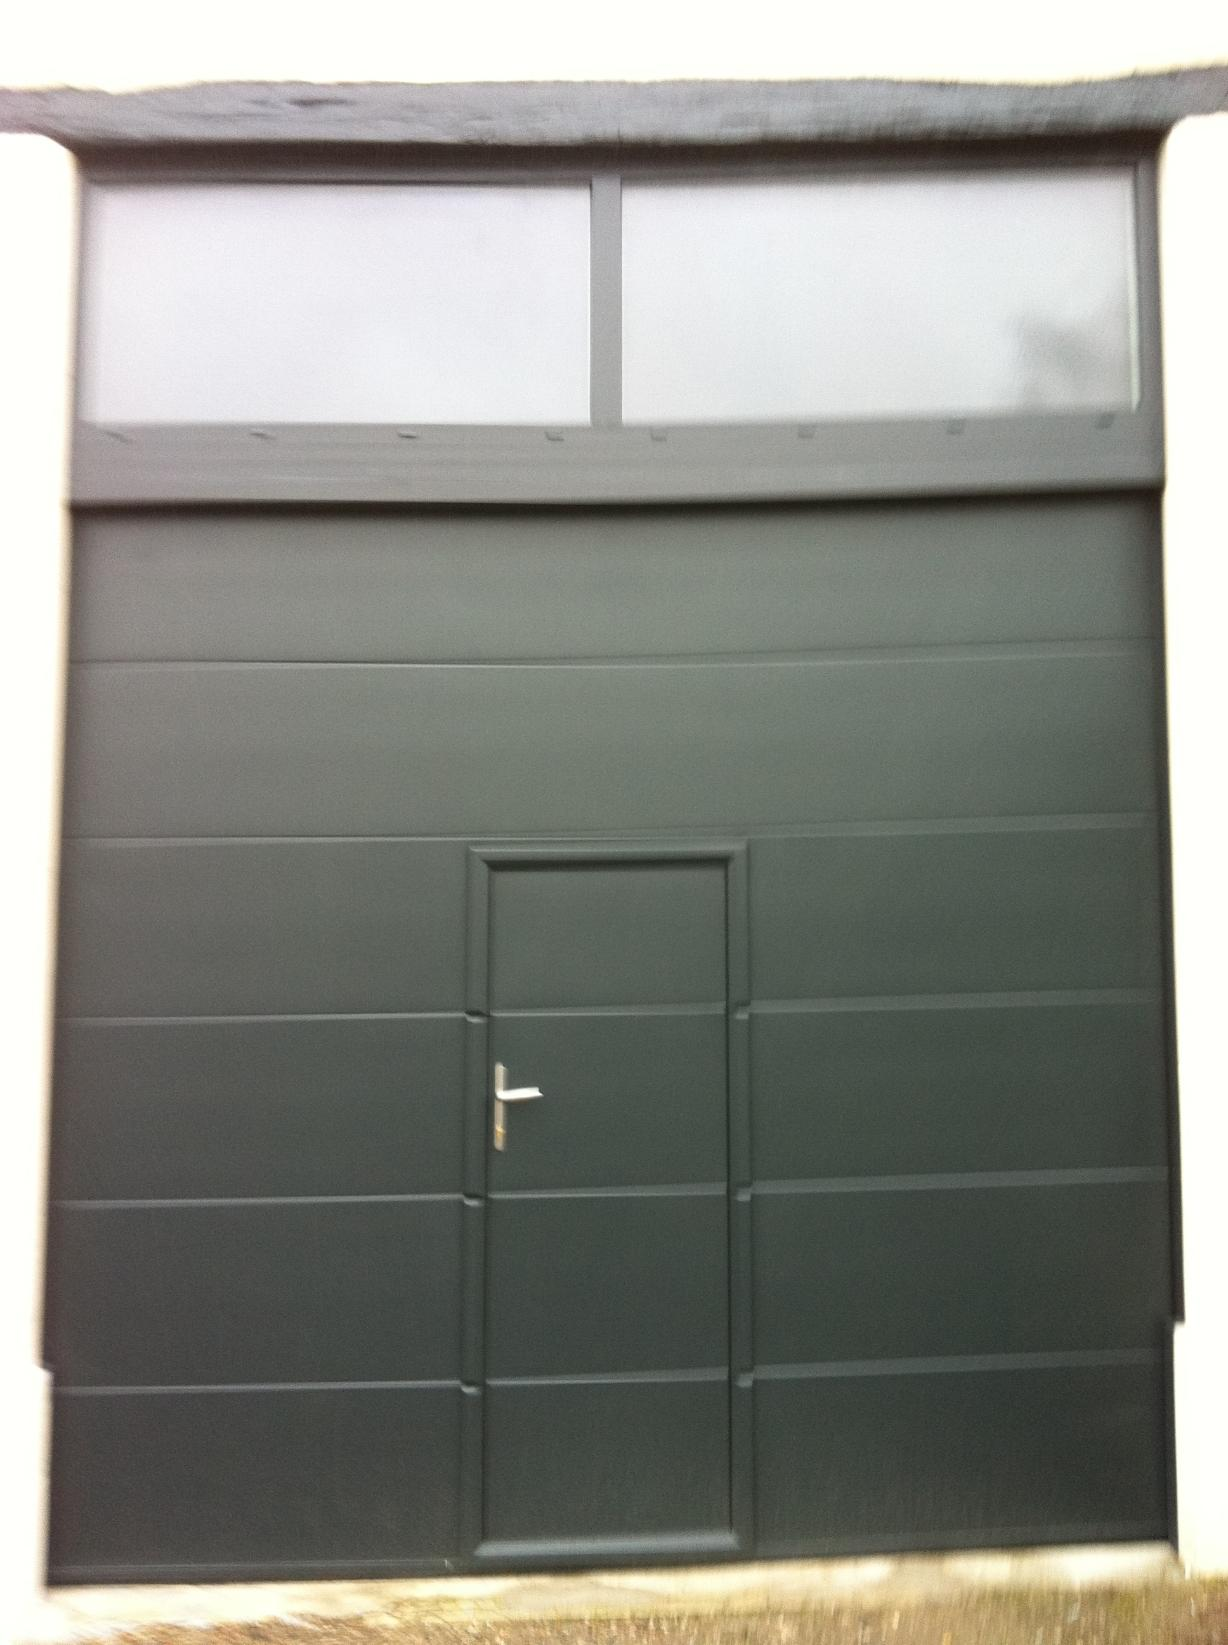 Leroy Merlin Portes De Garage Beautiful Formidable Porte Garage Sur - Porte de garage sectionnelle avec porte de service pvc sur mesure leroy merlin